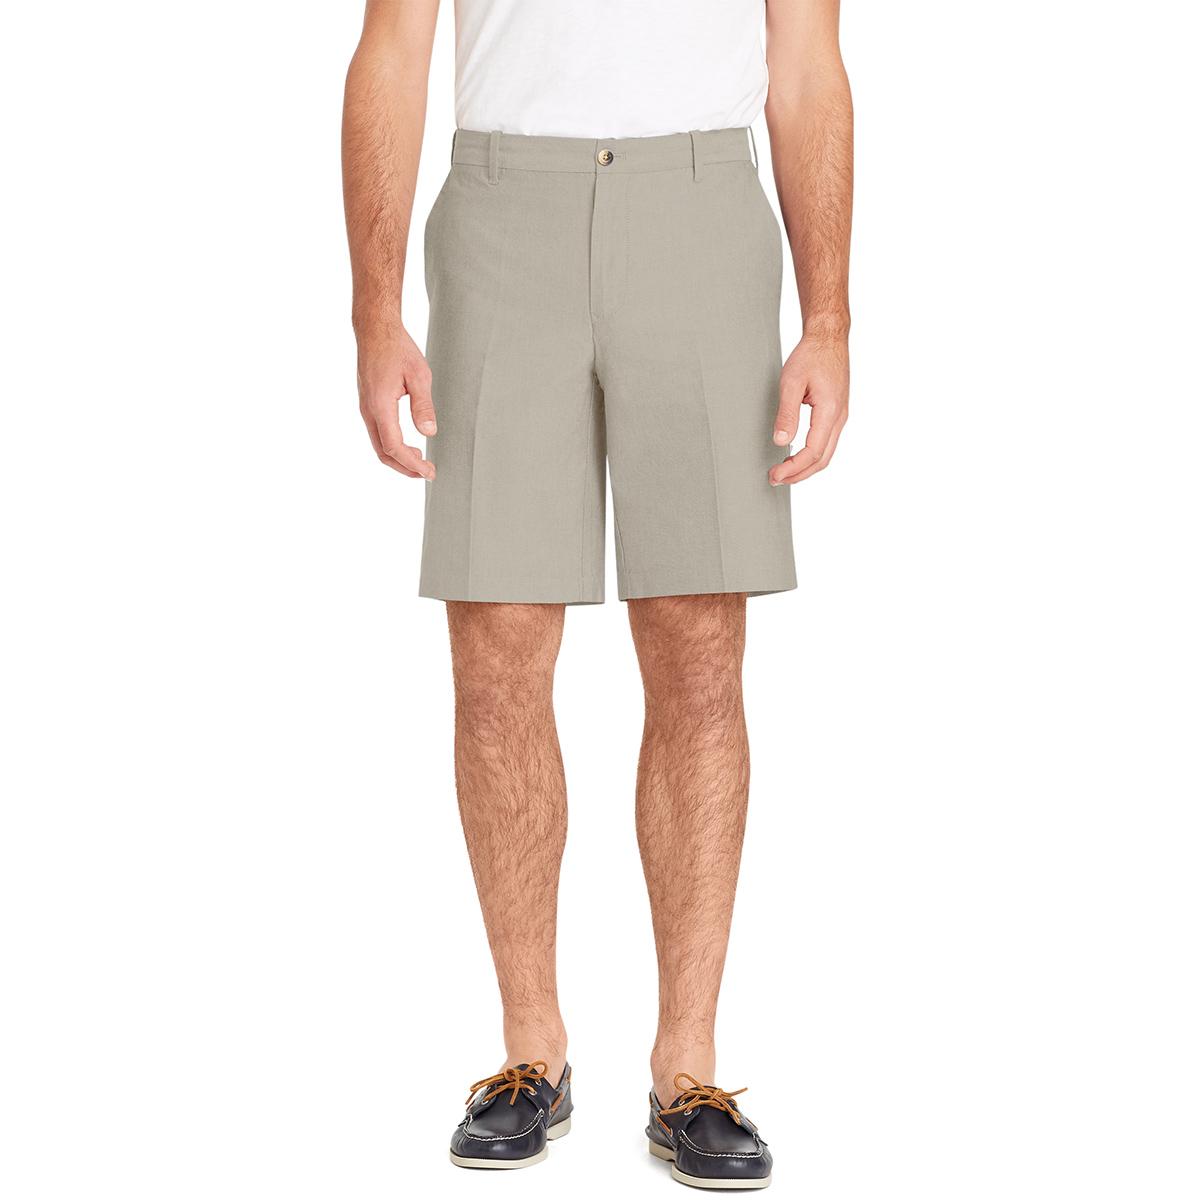 Izod Men's Newport Flat-Front Oxford Shorts - Brown, 34